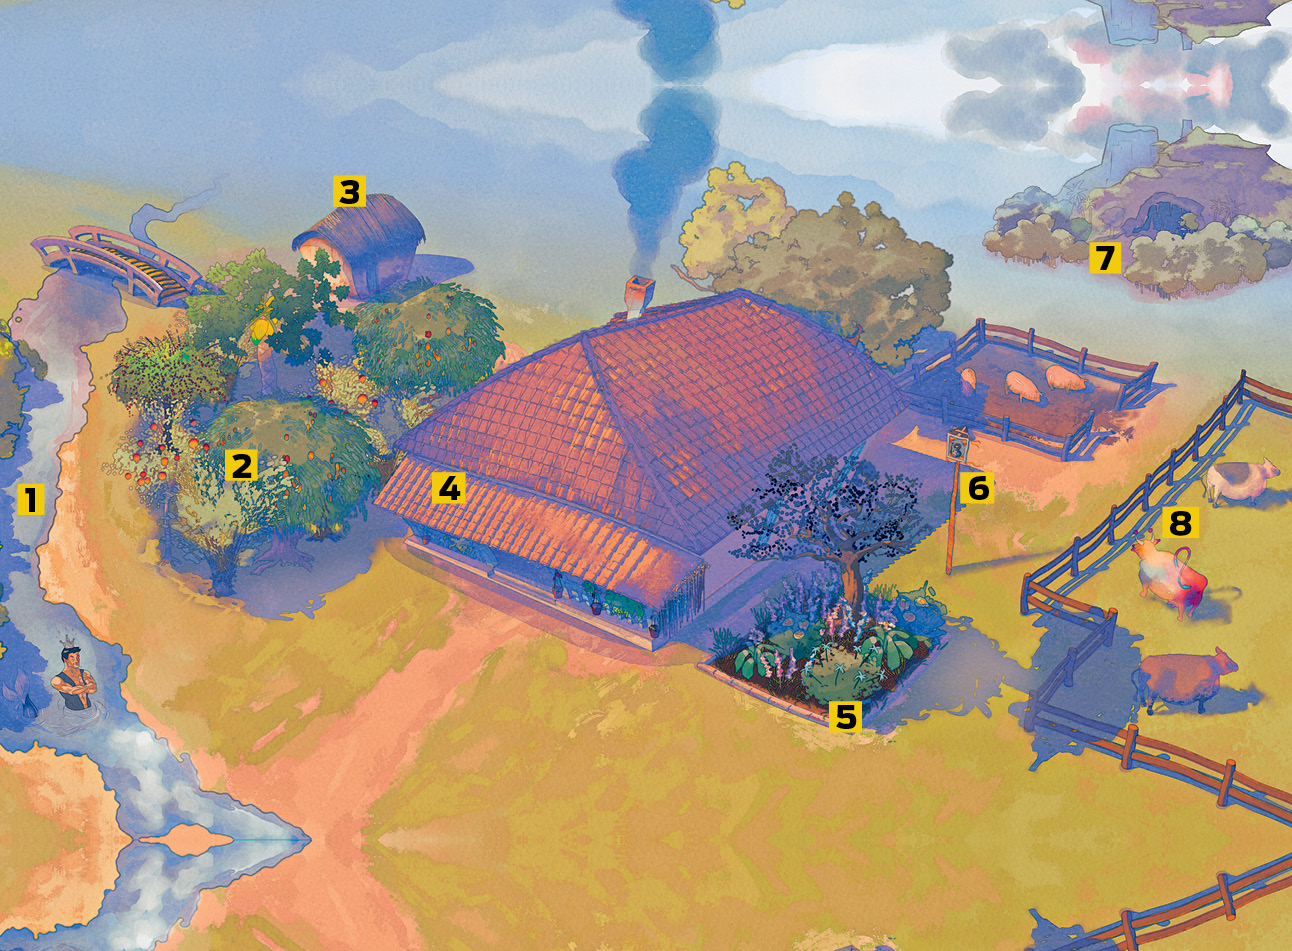 sitio pica-pau amarelo2